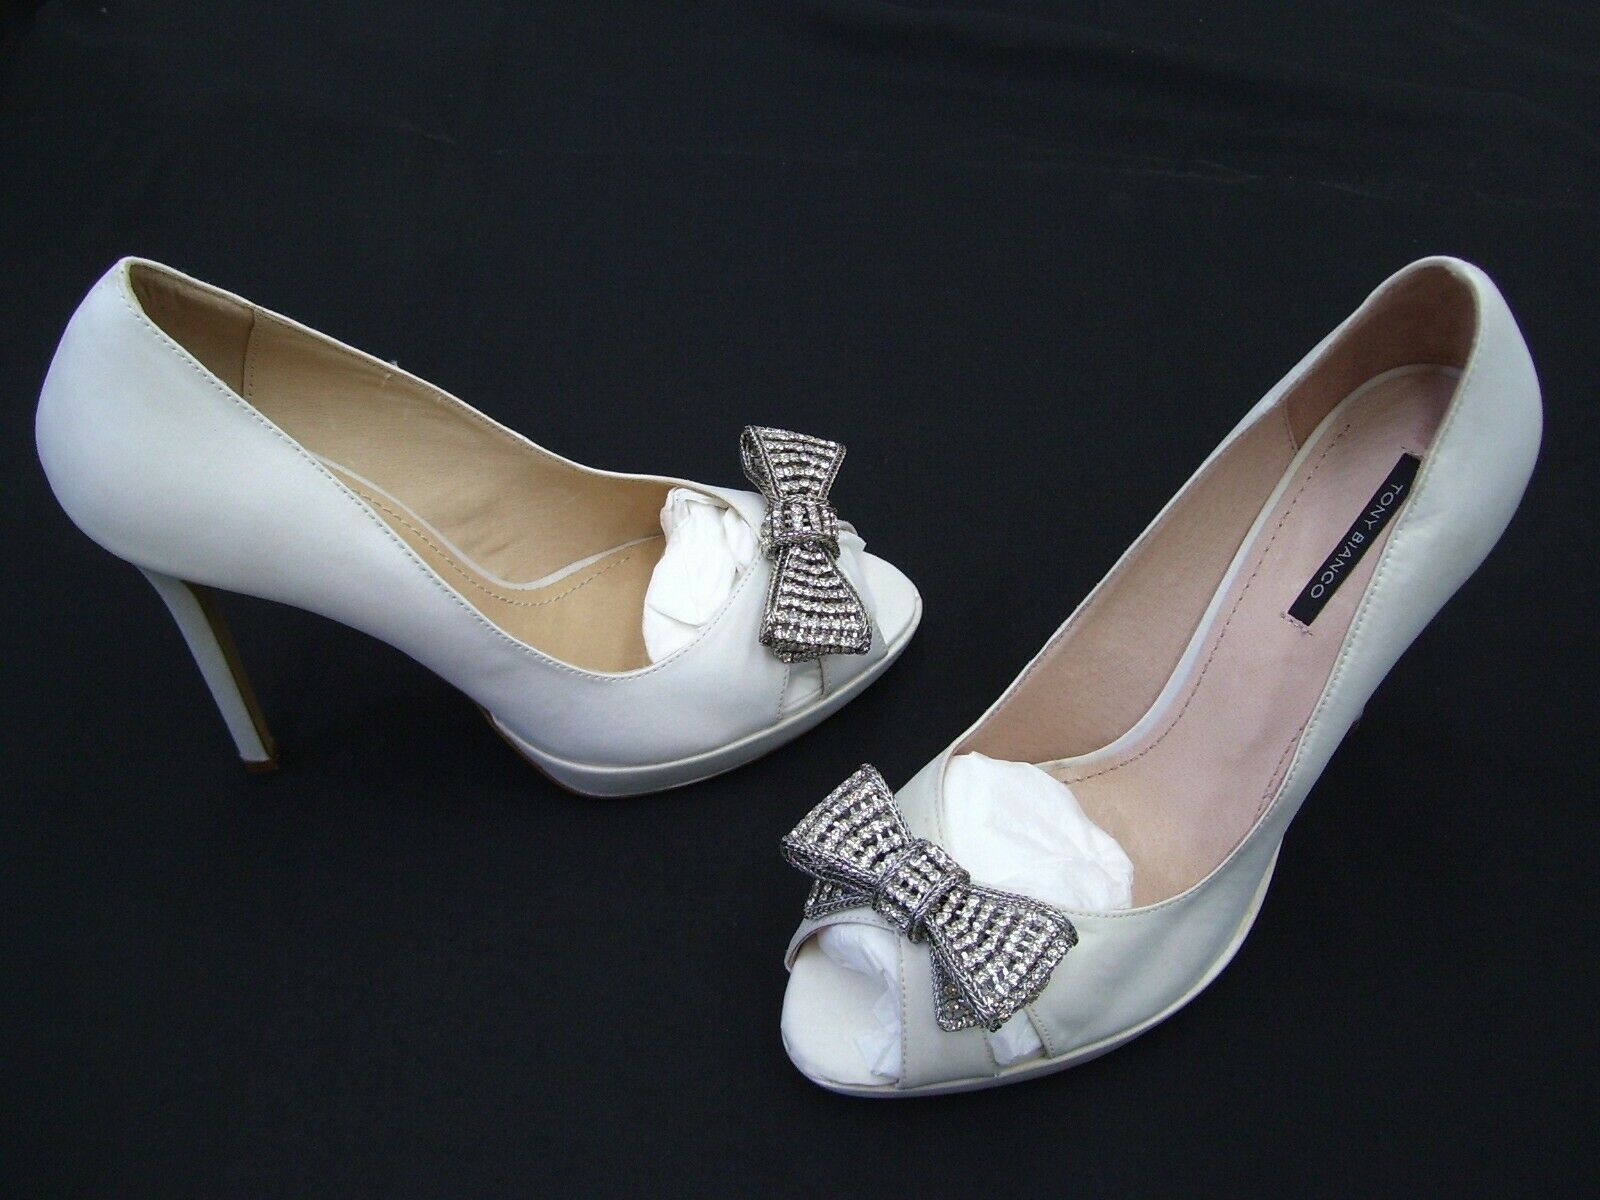 TONY BIANCO LADIES SHOES FORMAL DRESS WEDDING WORK HEELS IVORY GRETTEL SIZE 9.5